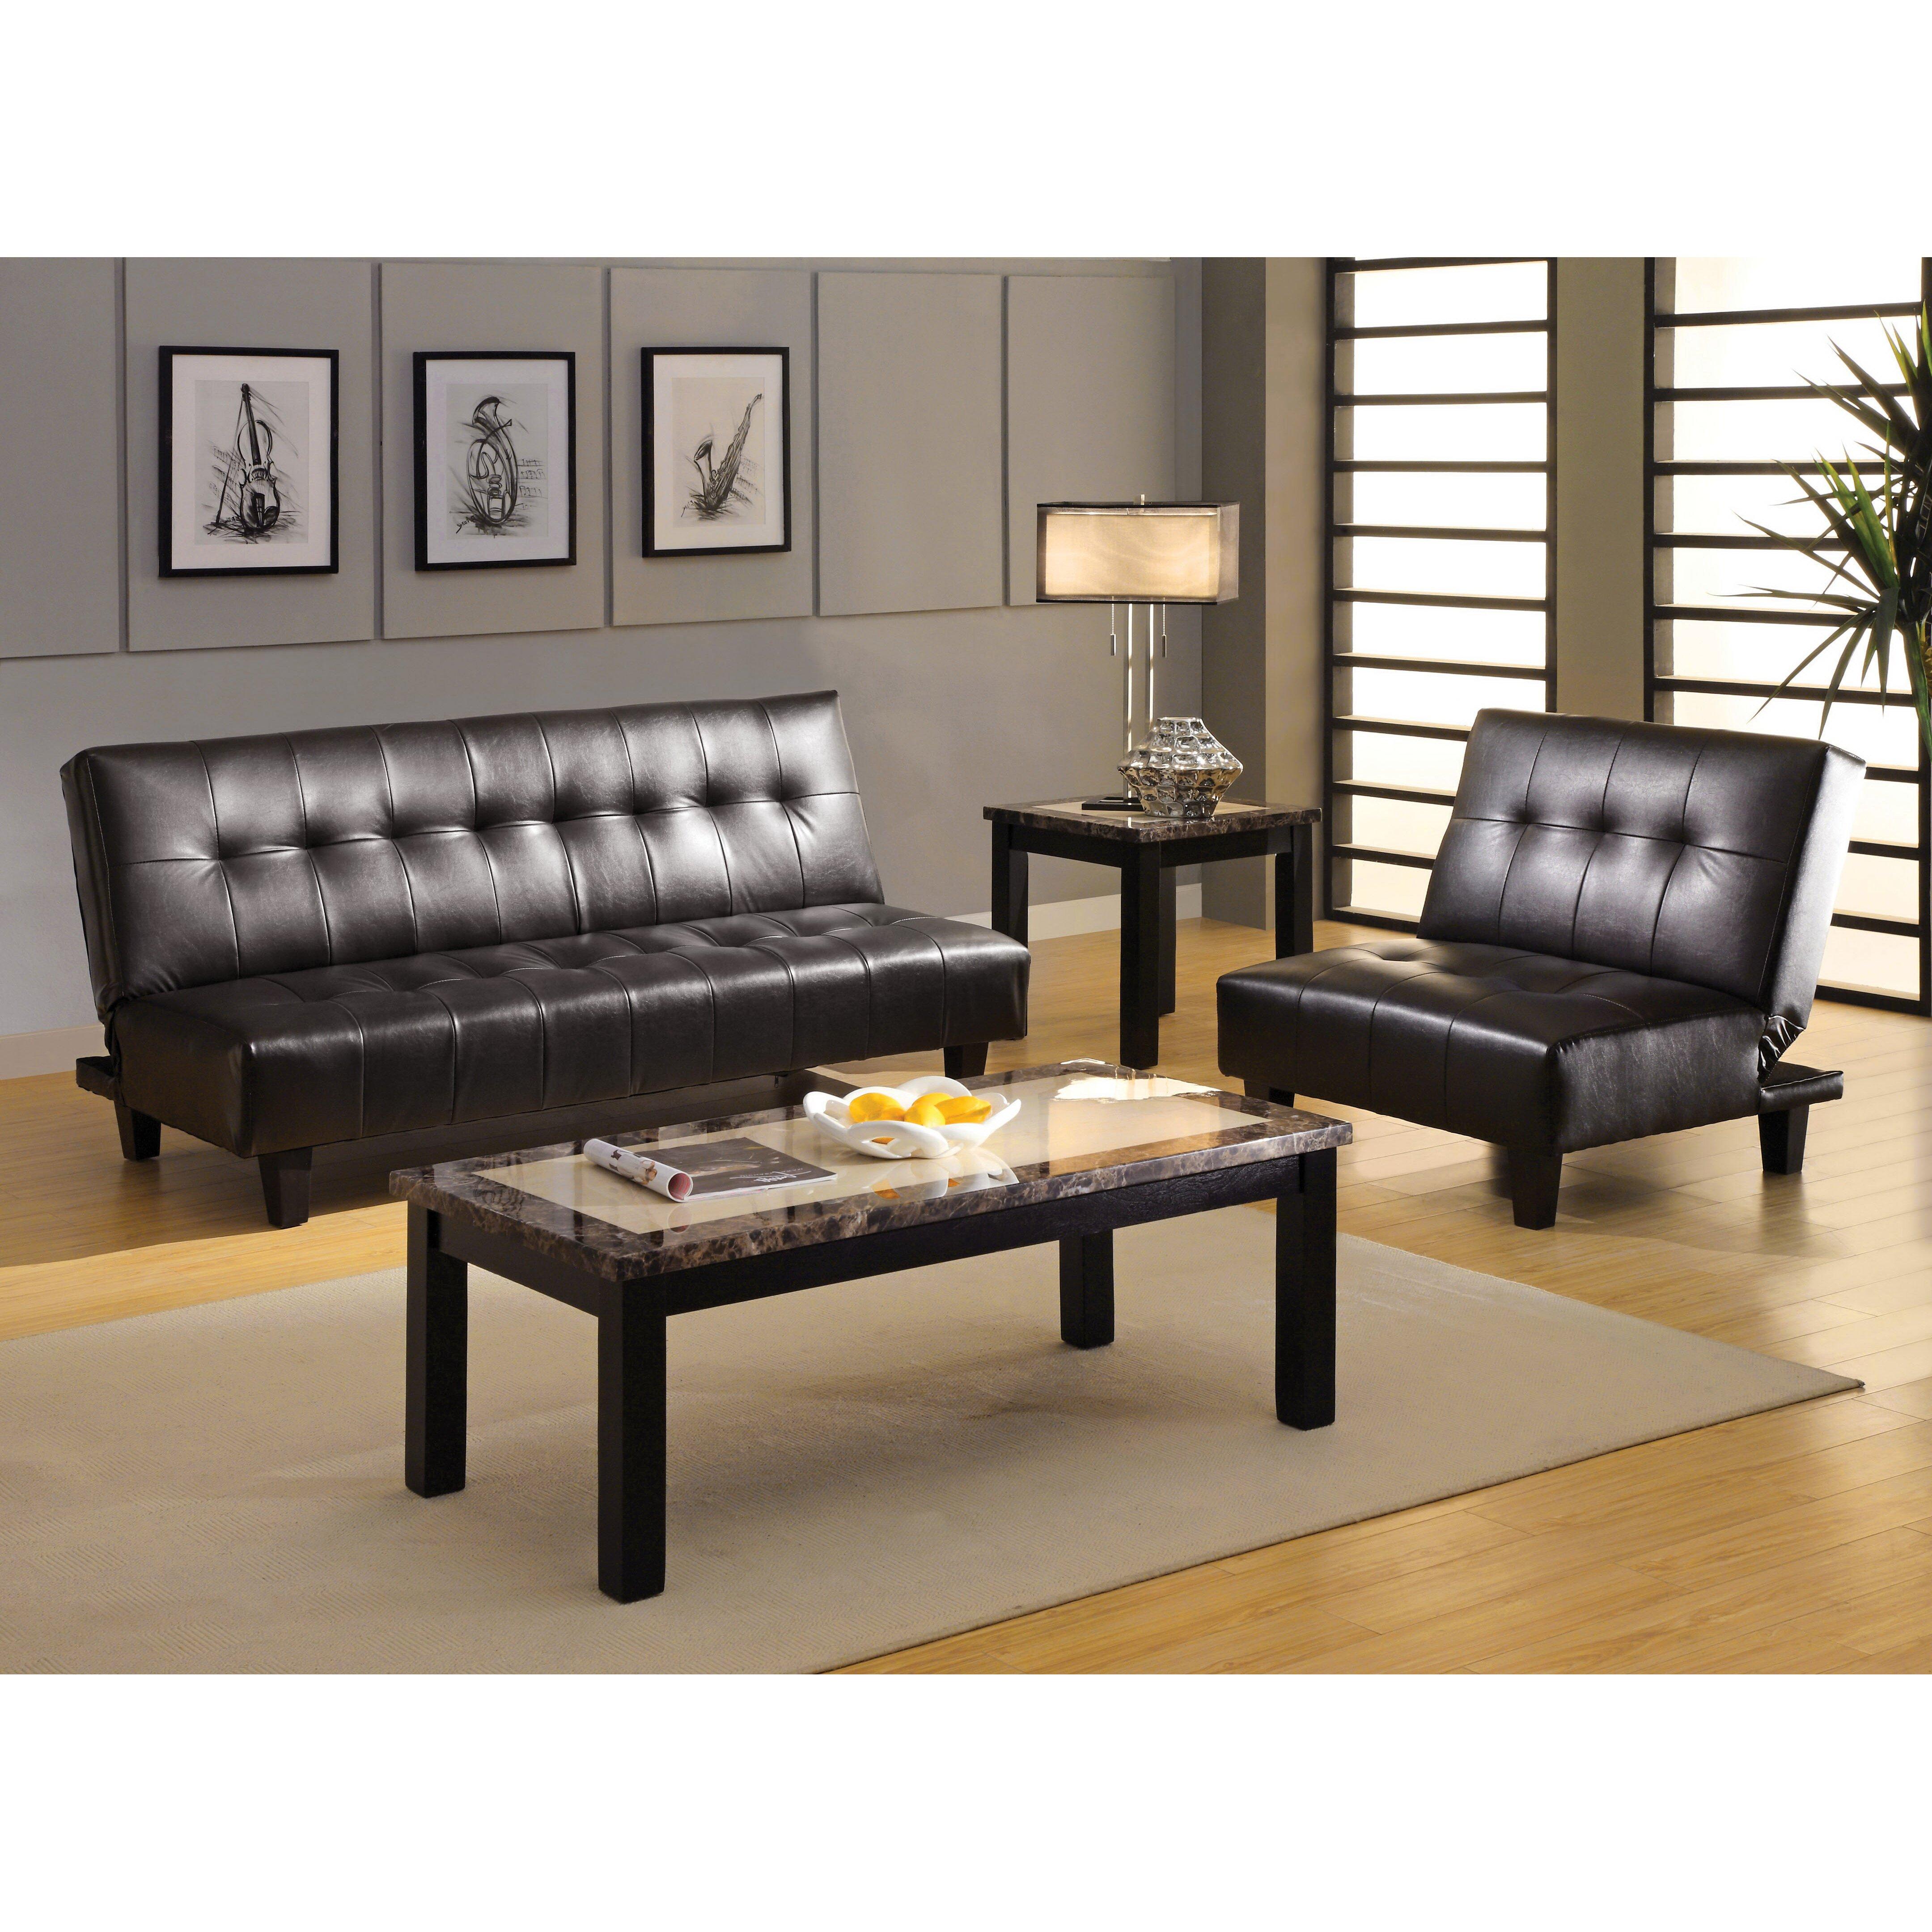 Hokku Designs Belmont Leatherette Convertible Sofa and